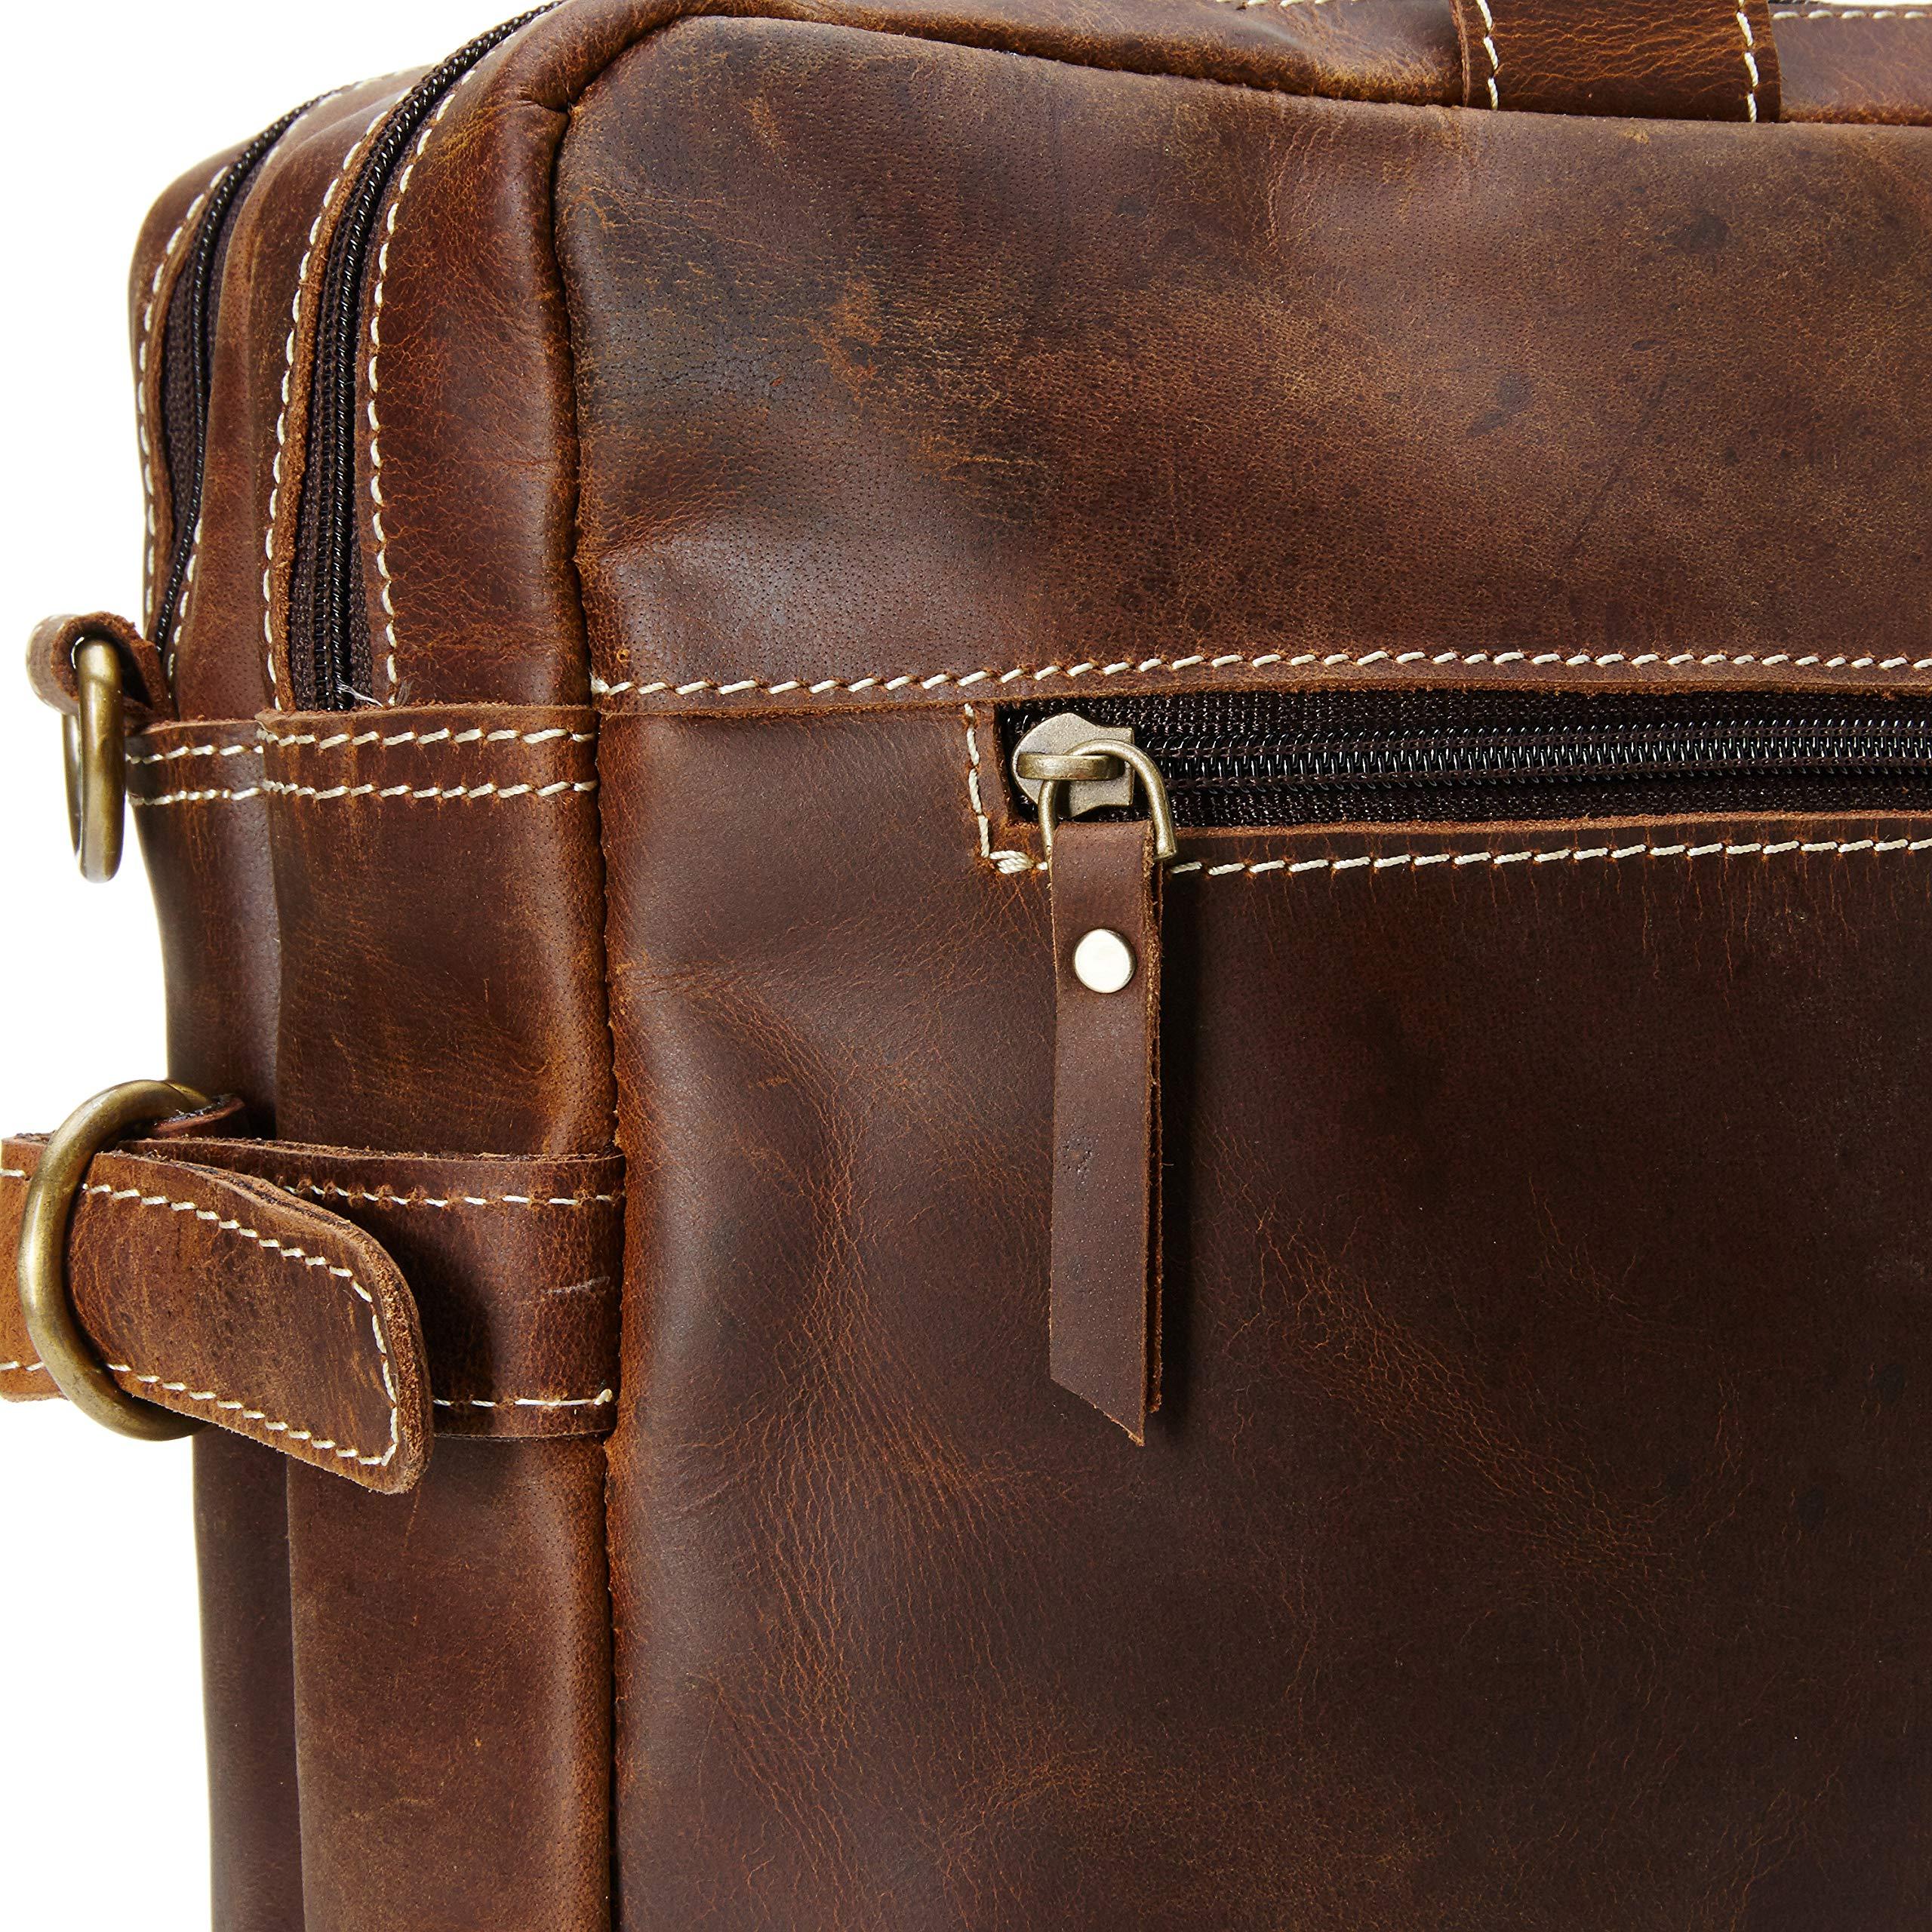 16 inch Vintage Buffalo Leather Messenger Satchel Laptop Briefcase Men's Bag Crazy Vintage Leather Messenger (Brown) by Ruzioon (Image #4)